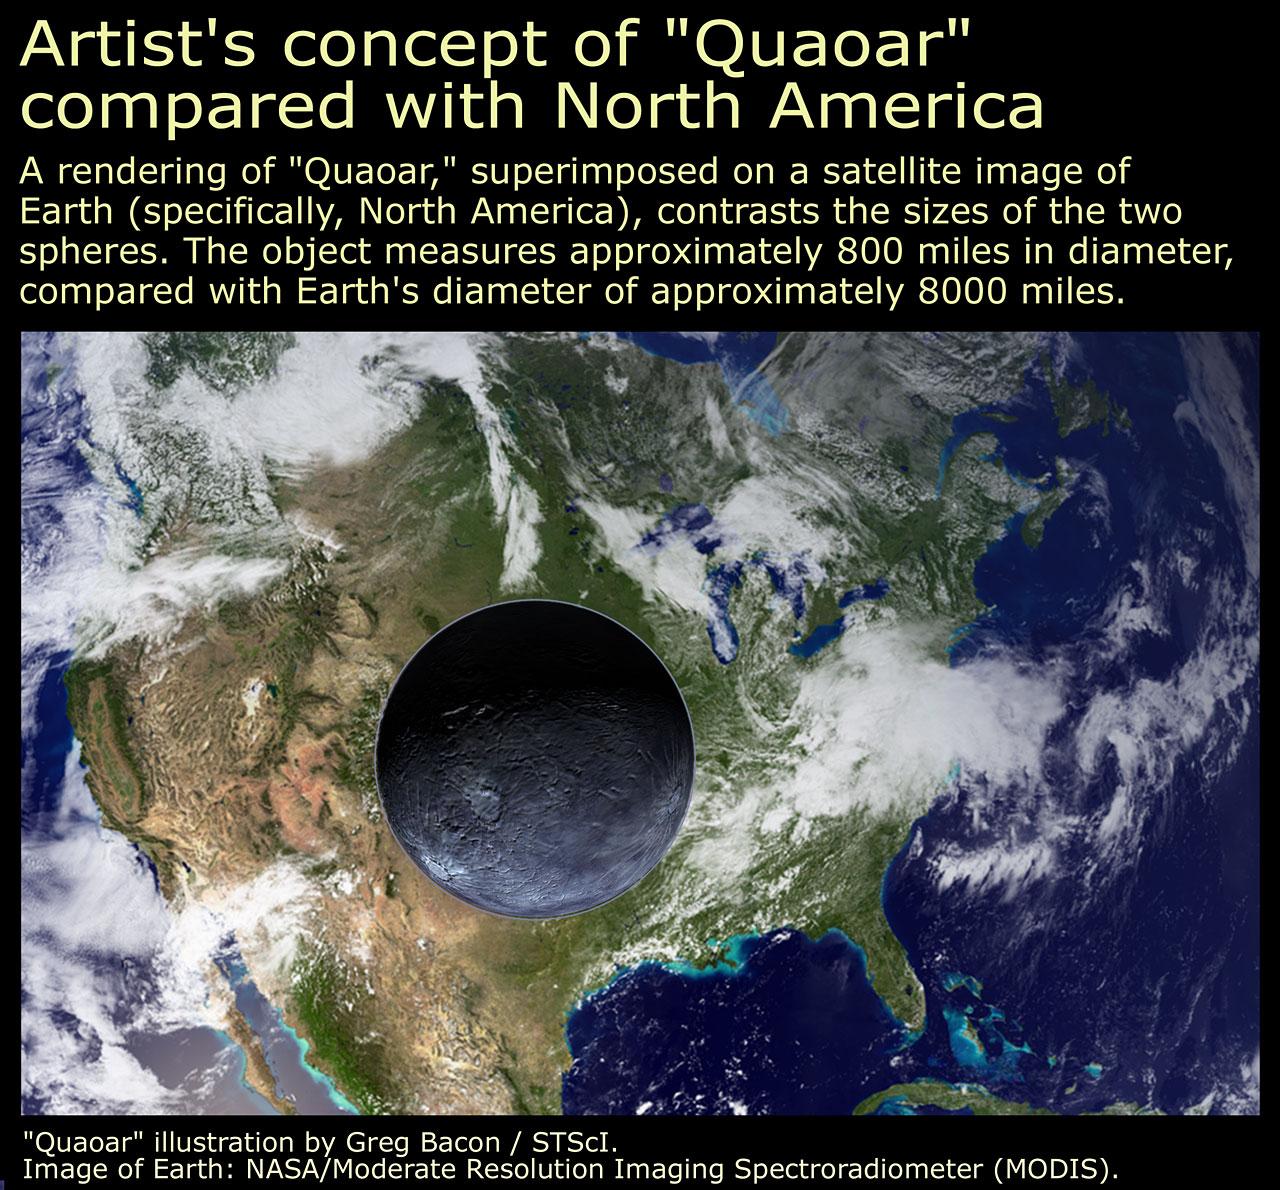 Quaoar's Size Compared with North America